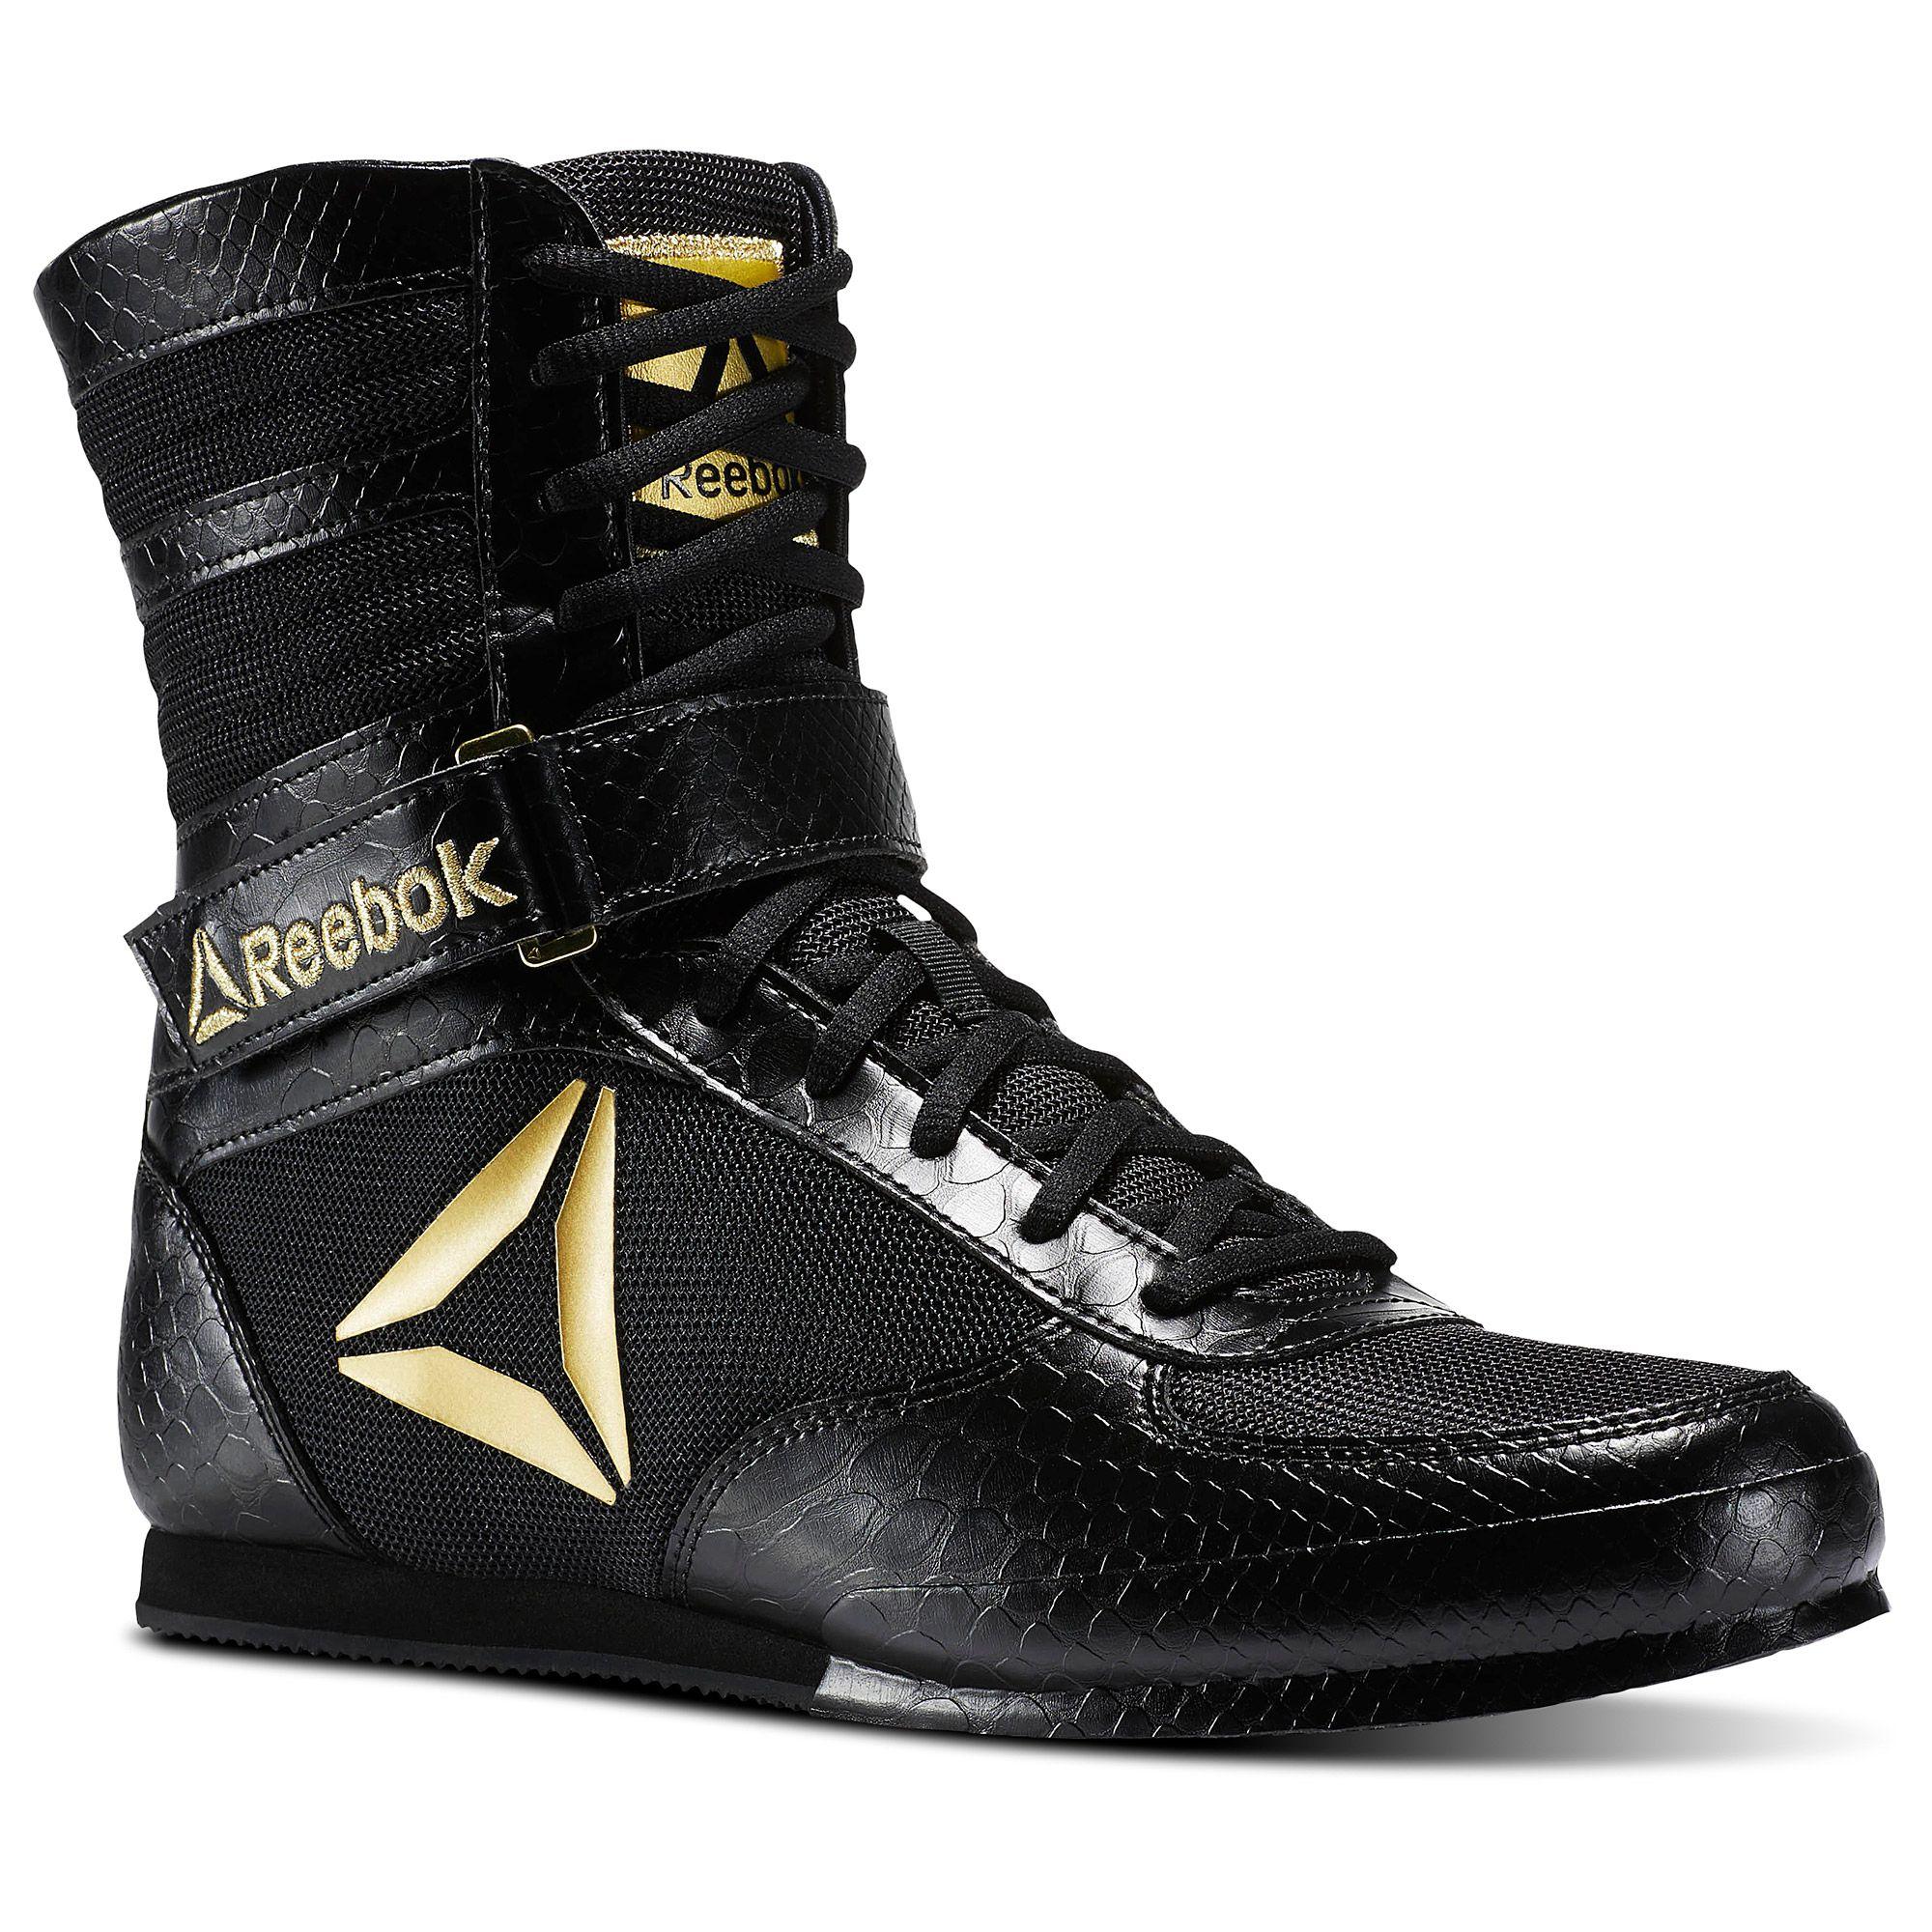 Reebok Men's Boot Boxing Shoe | Airfrov